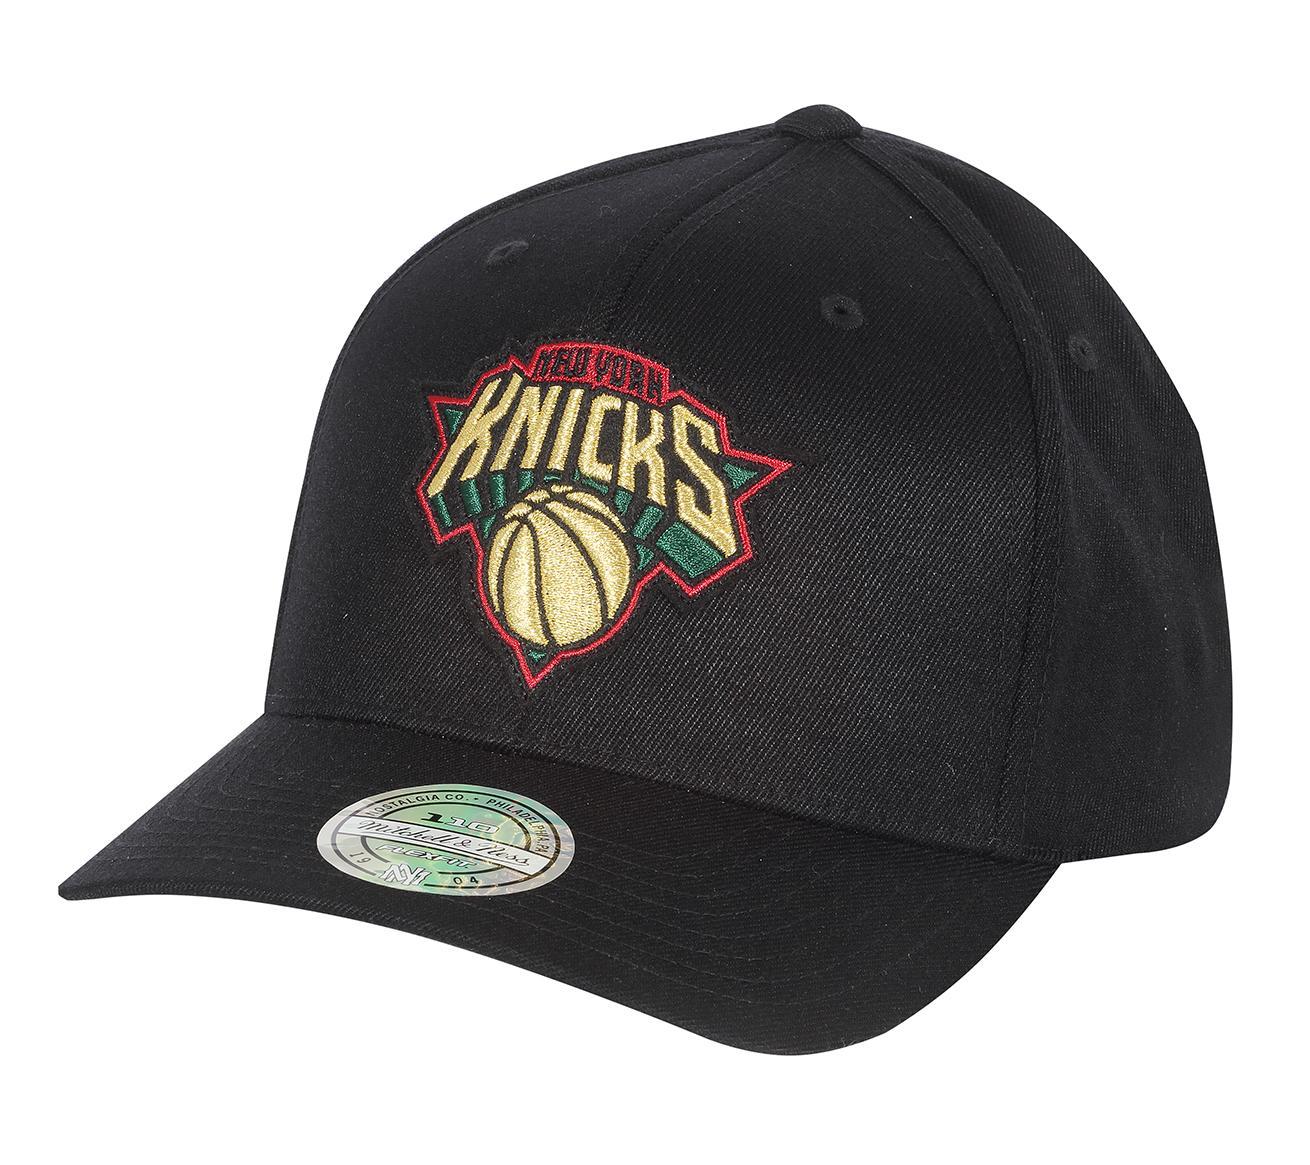 22f3dc91 Mitchell & Ness | New York Knicks Luxe 110 Snapback